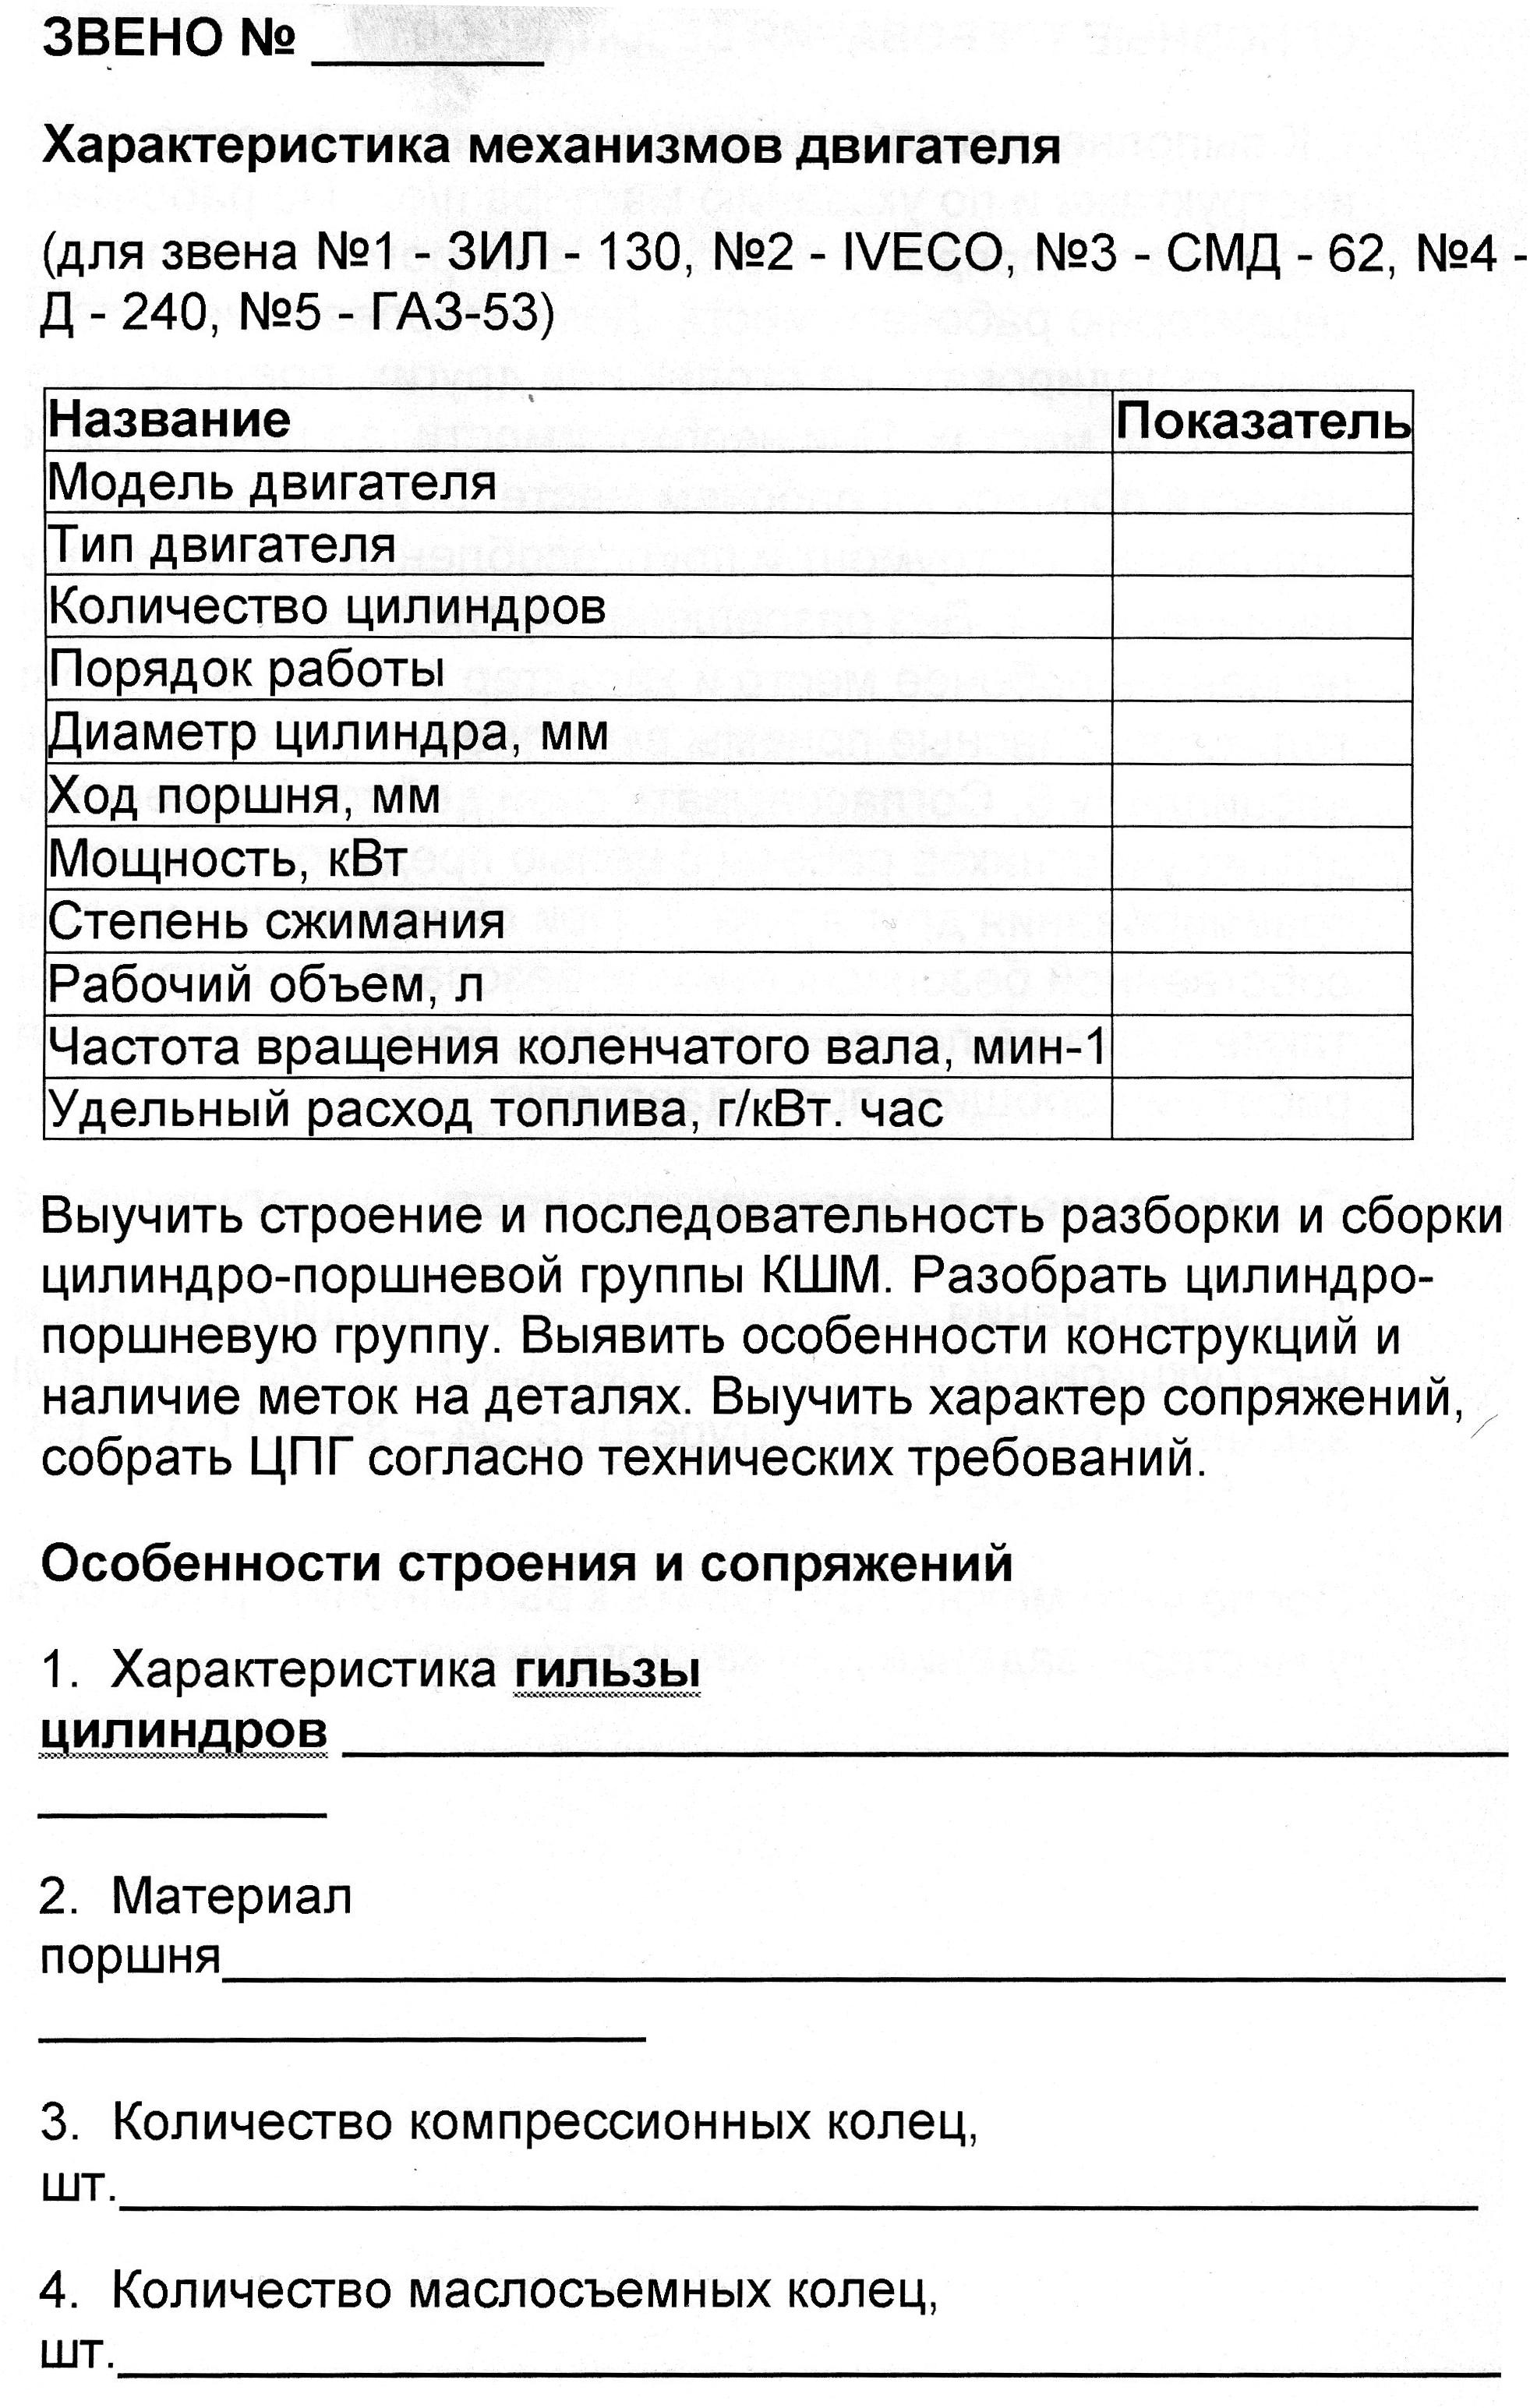 C:\Users\Василий Мельченко\Pictures\img583.jpg